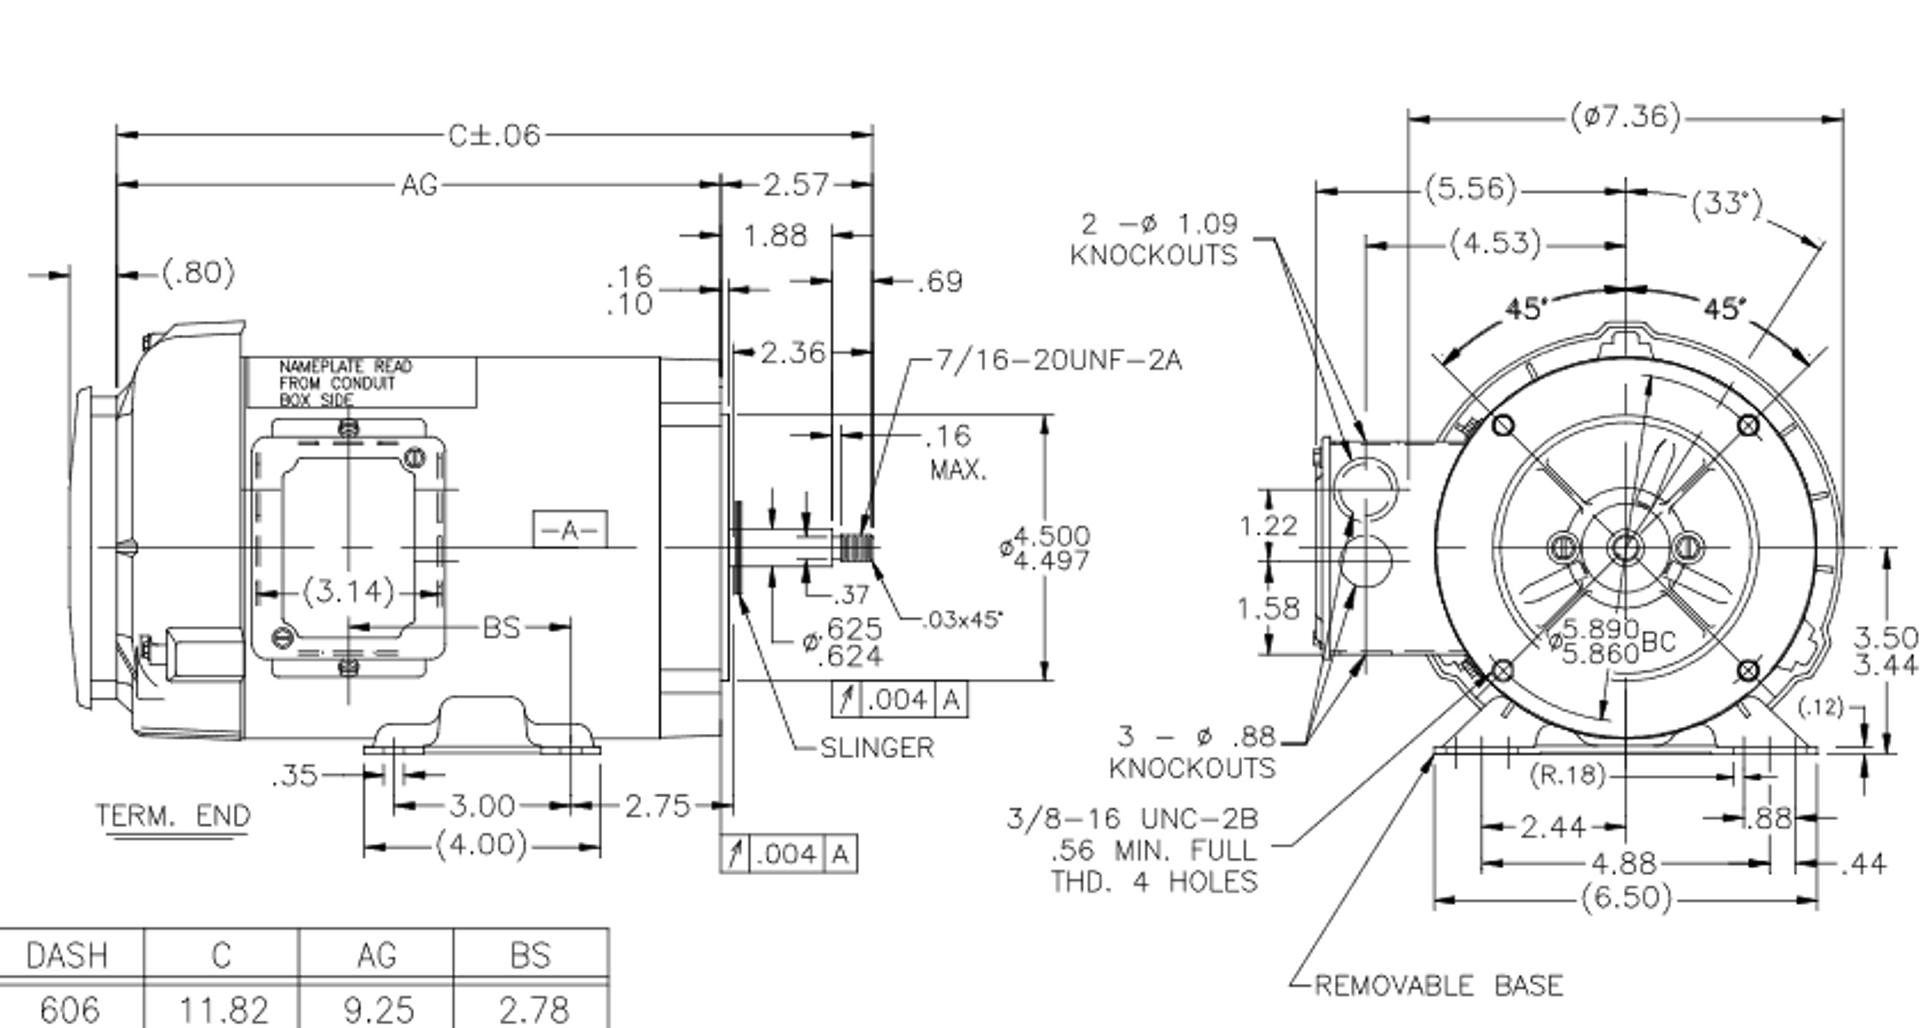 J062 Marathon 3/4 hp 3-Phase Jet Pump Motor 3600 RPM 208